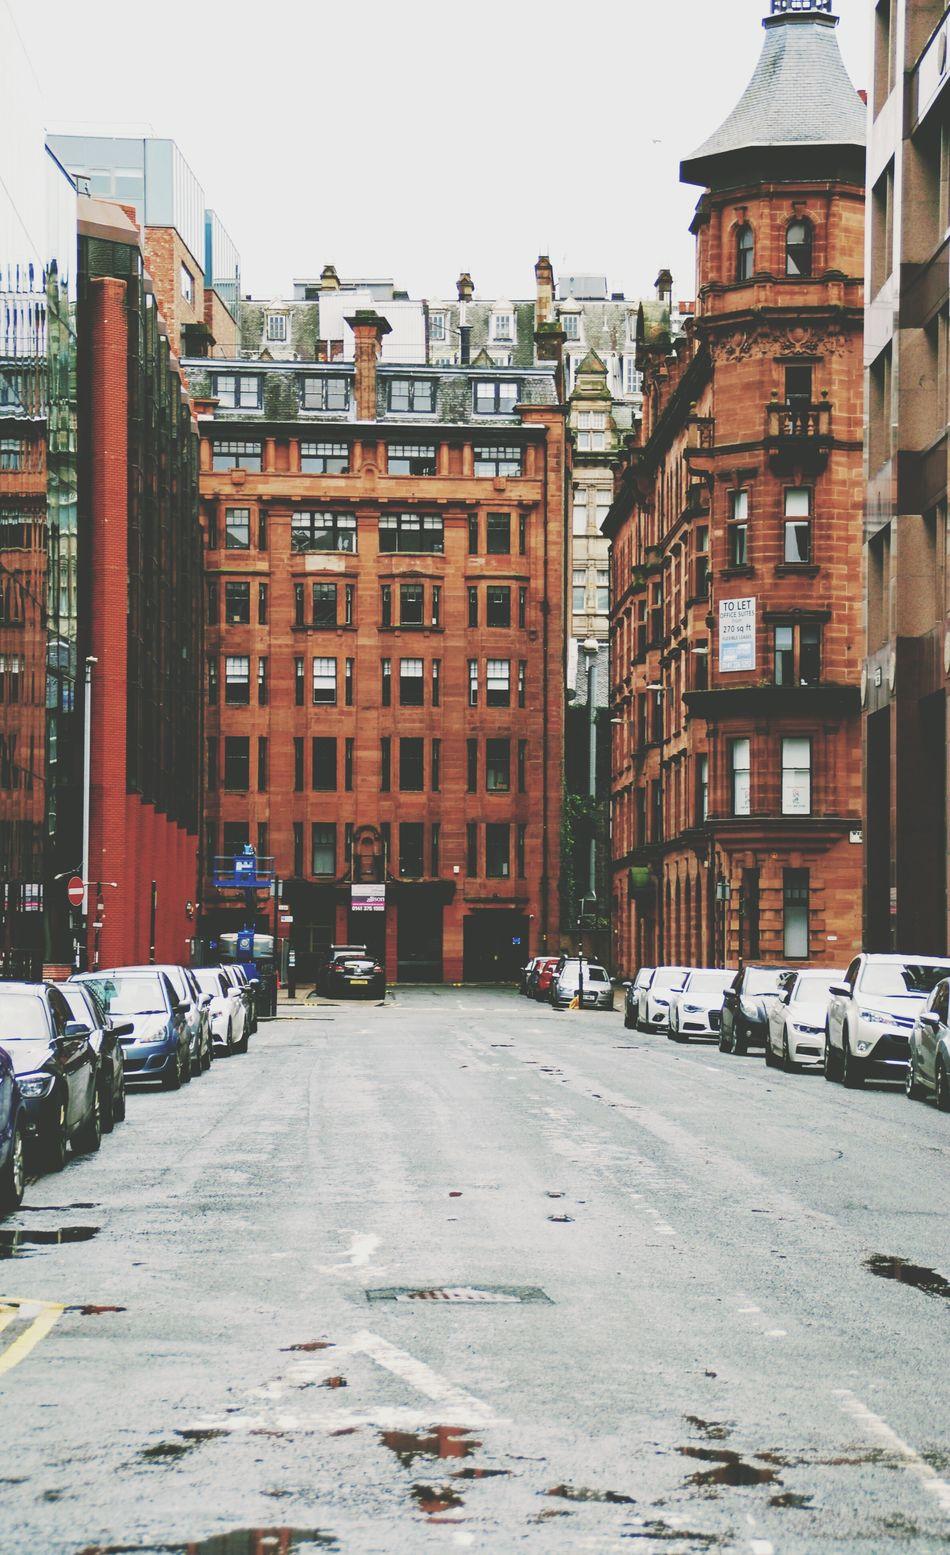 Glasgow  GLASGOW CITY Glasgow Streets Rainystreets Red Houses Scotland Streetphotography Streetview Oldhouses Eyemphotography Eyemstreetphoto Eyem Best Shots